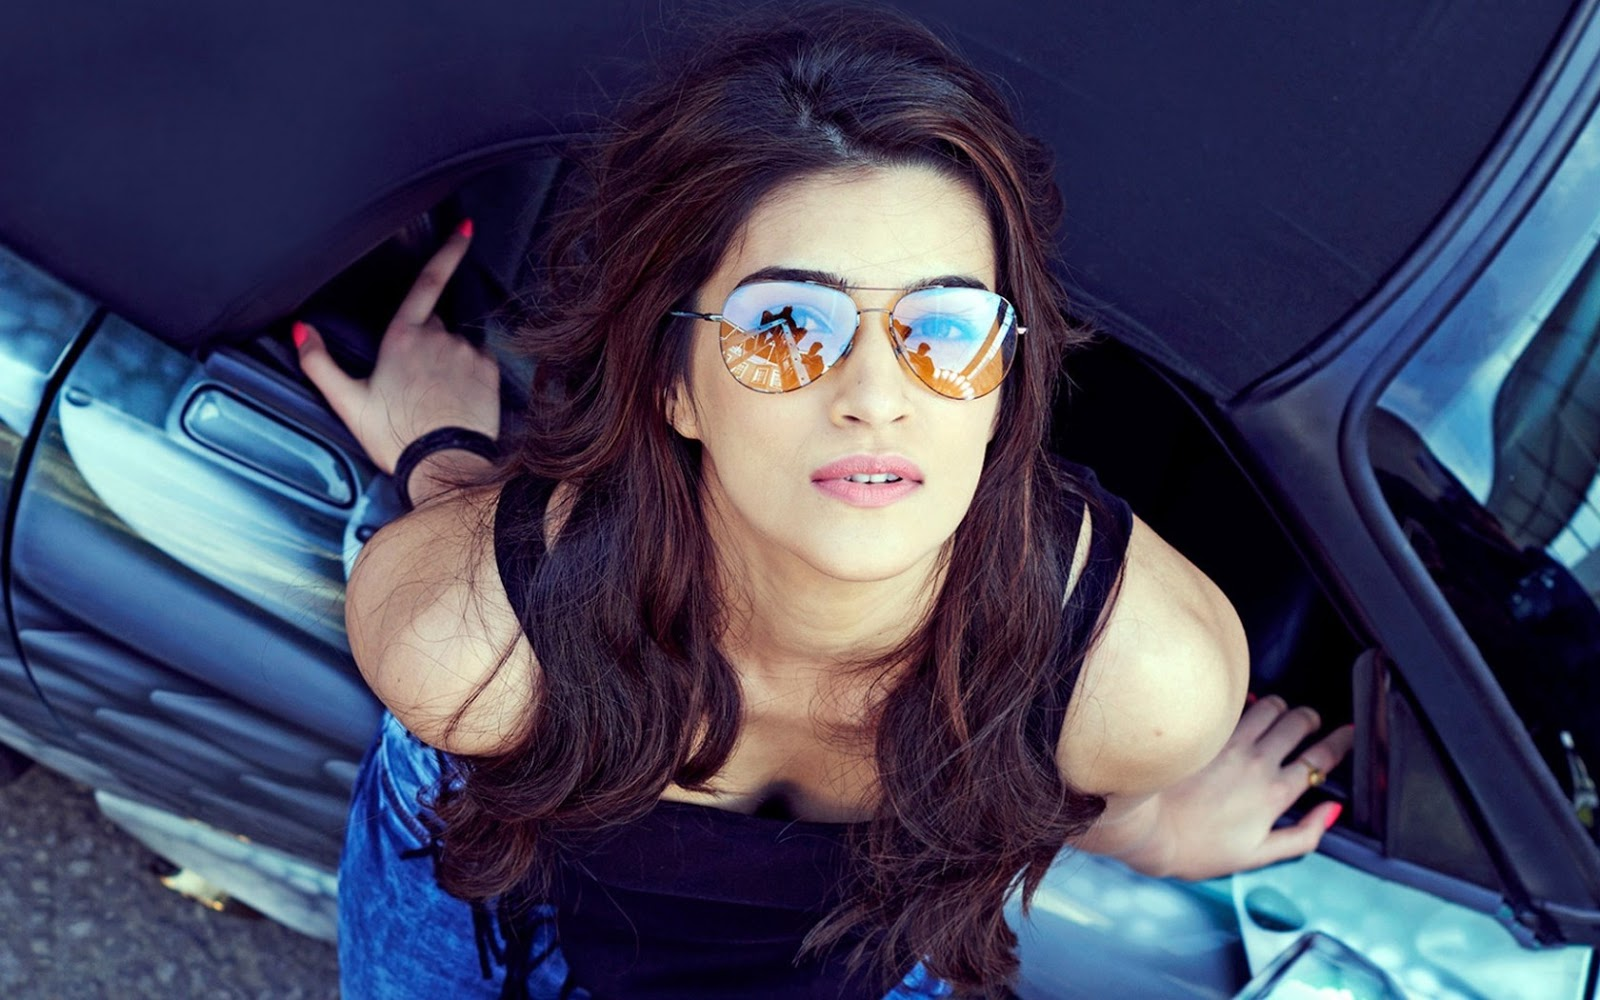 Hd wallpaper yogi adityanath - Top 10 Superstar Actresses Kriti Sanon Hd Wallpaper Latest